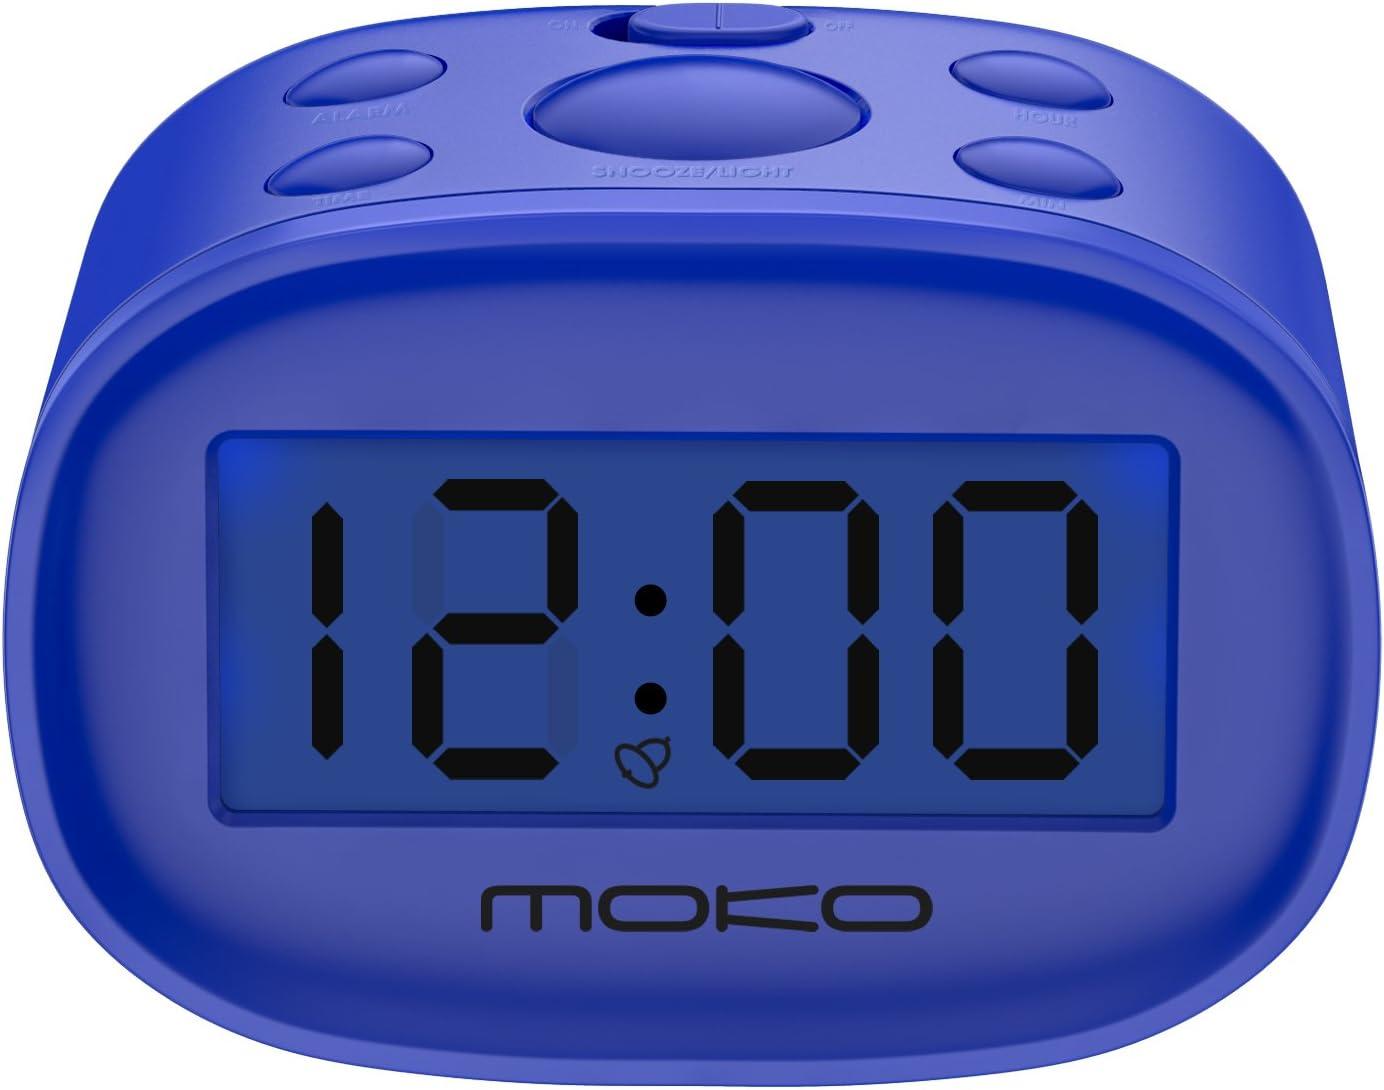 Max 59% OFF OFFicial mail order MoKo Kids Alarm Clock High Accuracy LCD Mini Cl Digital Display